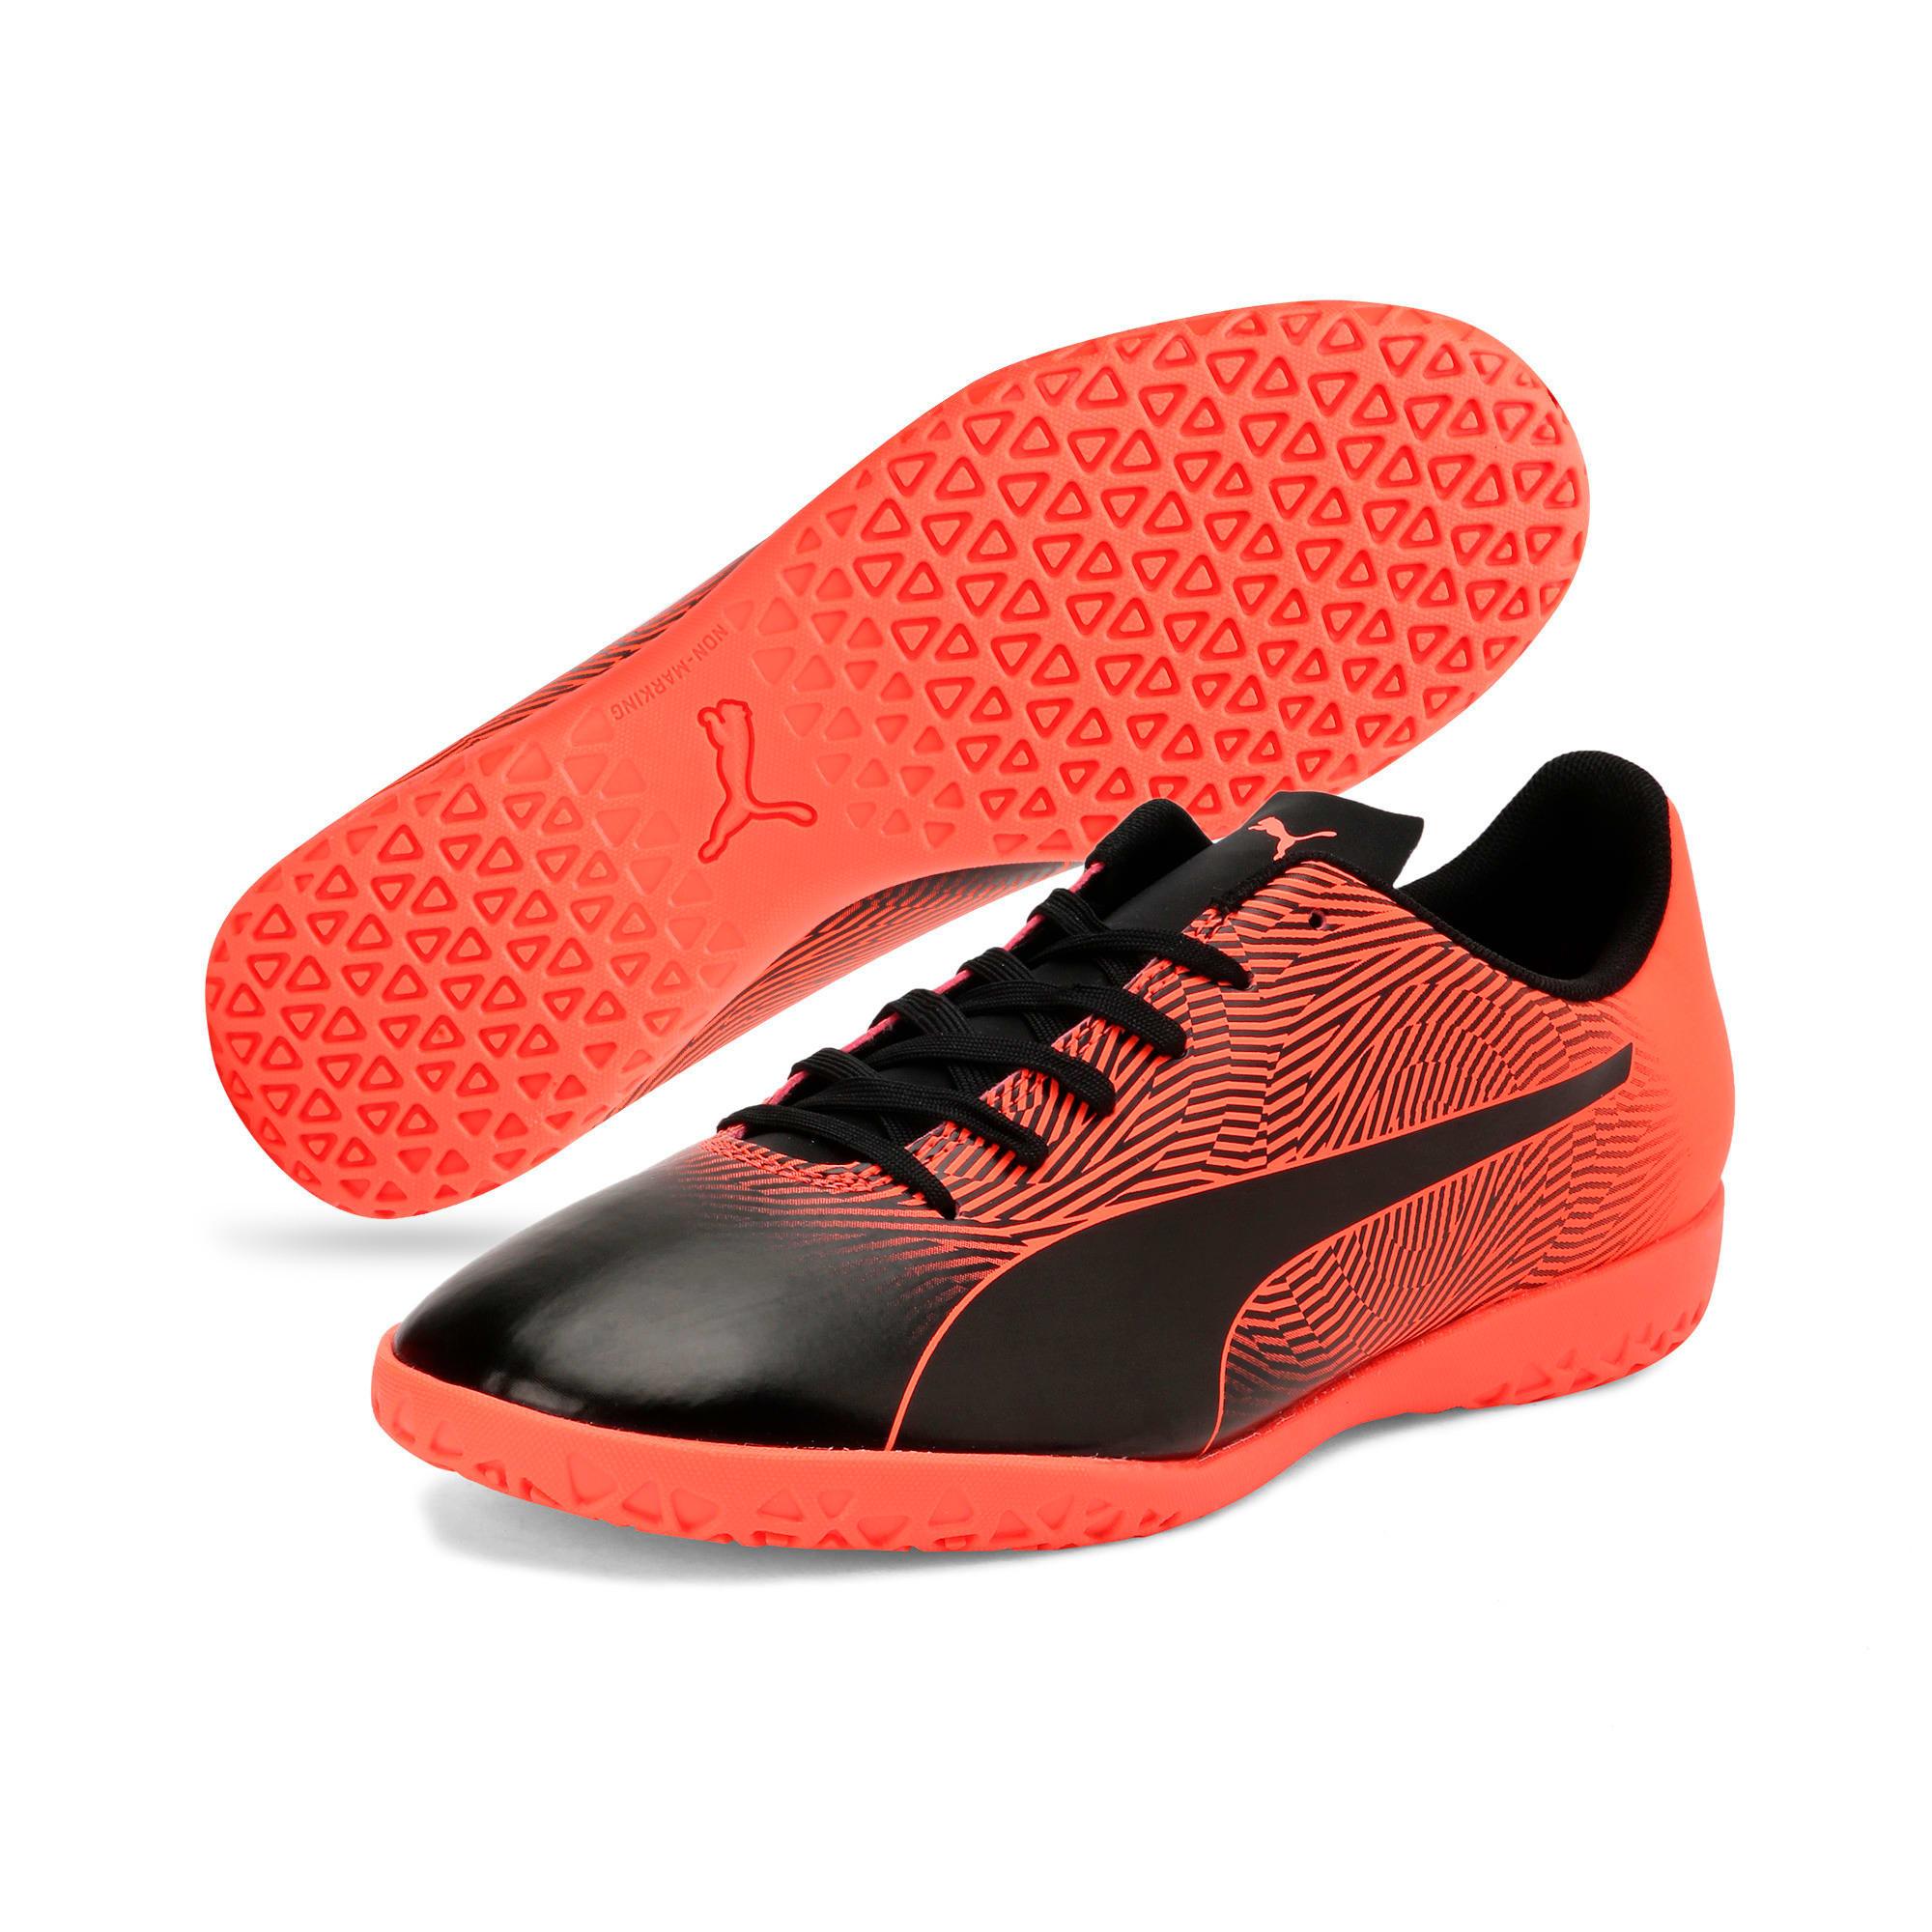 Thumbnail 3 of PUMA Spirit II IT Men's Football Boots, Puma Black-Nrgy Red, medium-IND